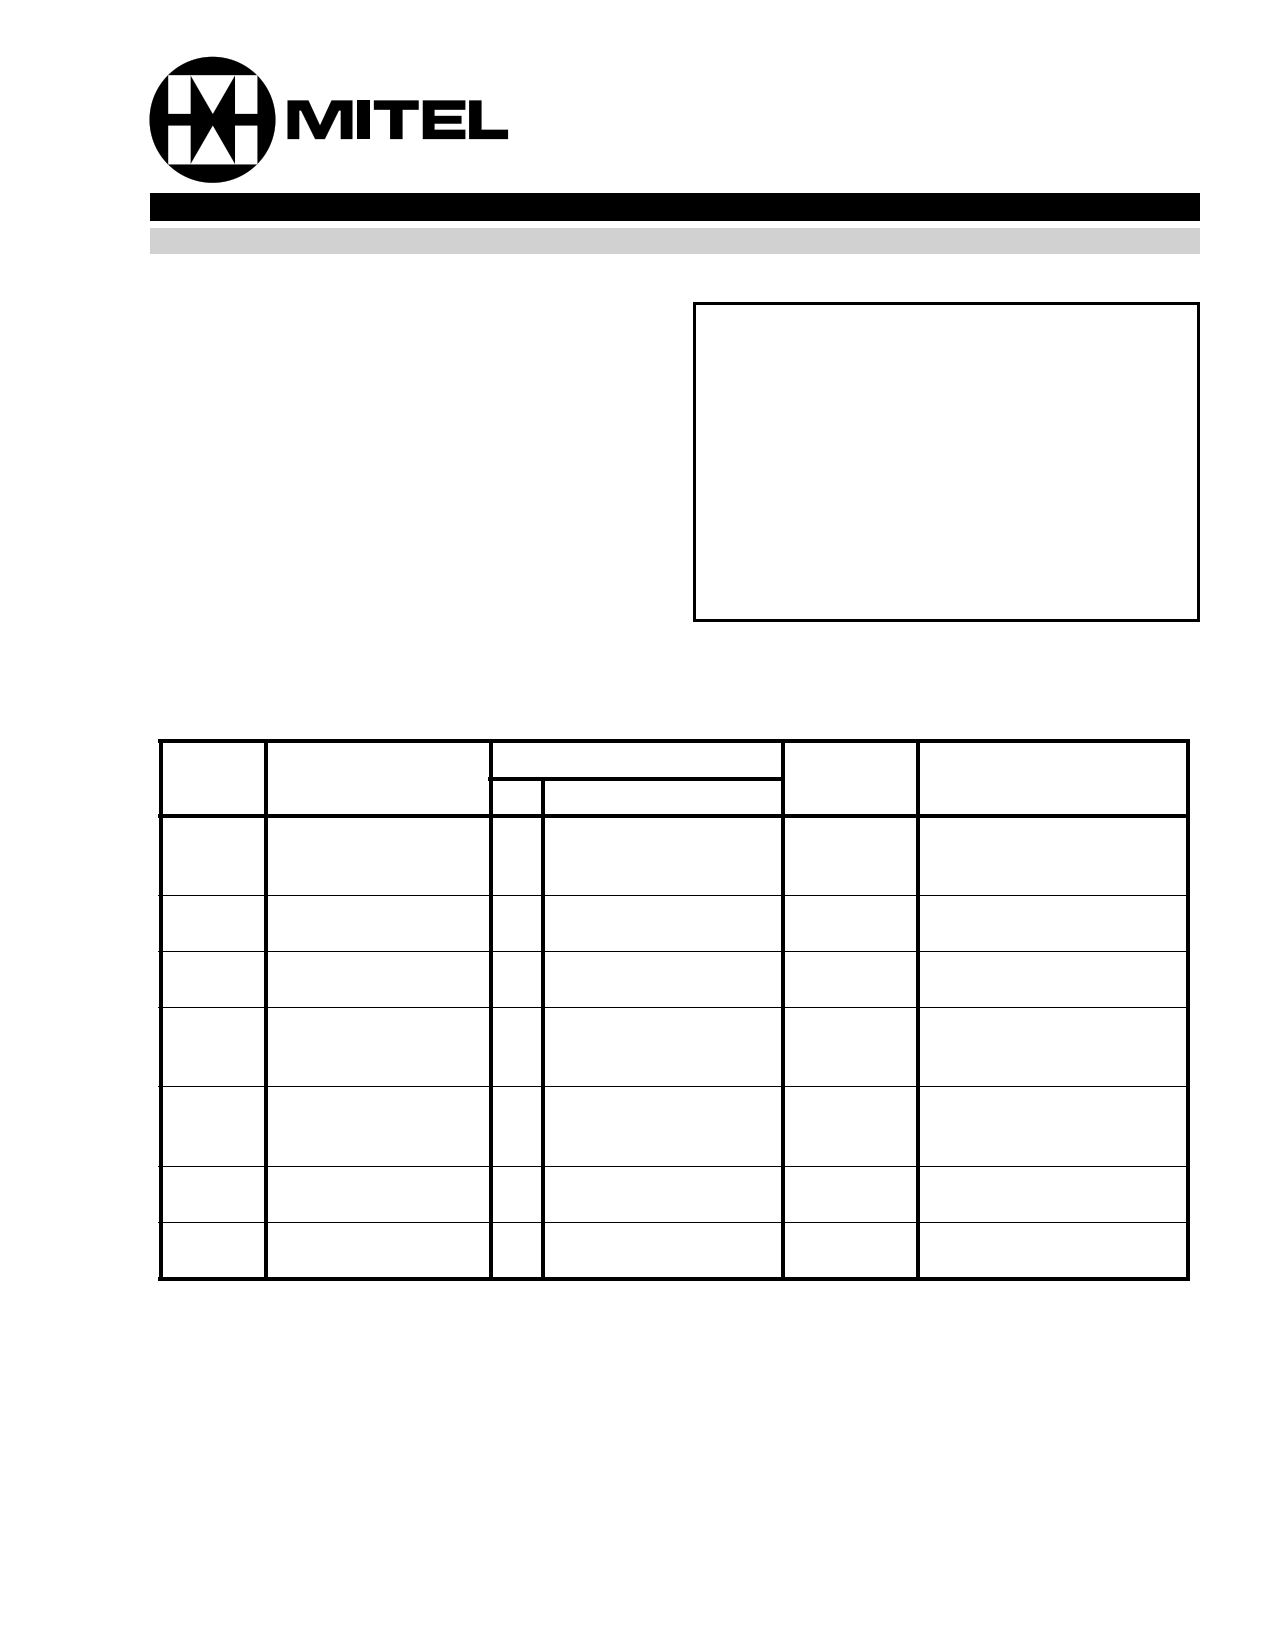 MB6017 데이터시트 및 MB6017 PDF